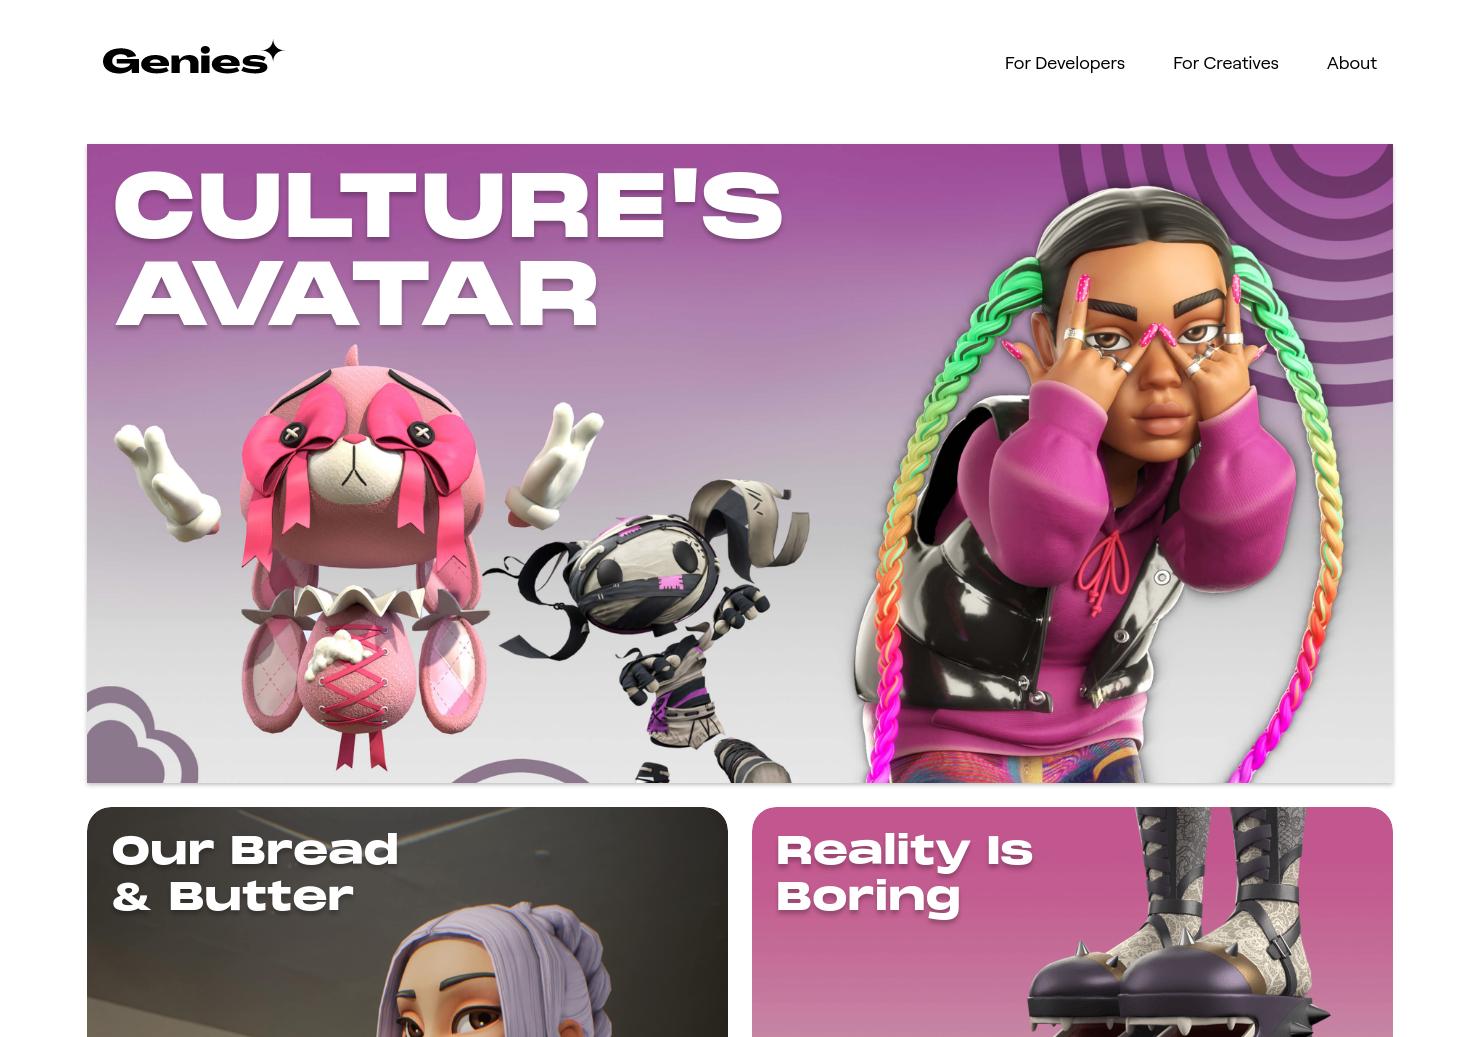 Genies 3D Avatar & Digital Goods SDK